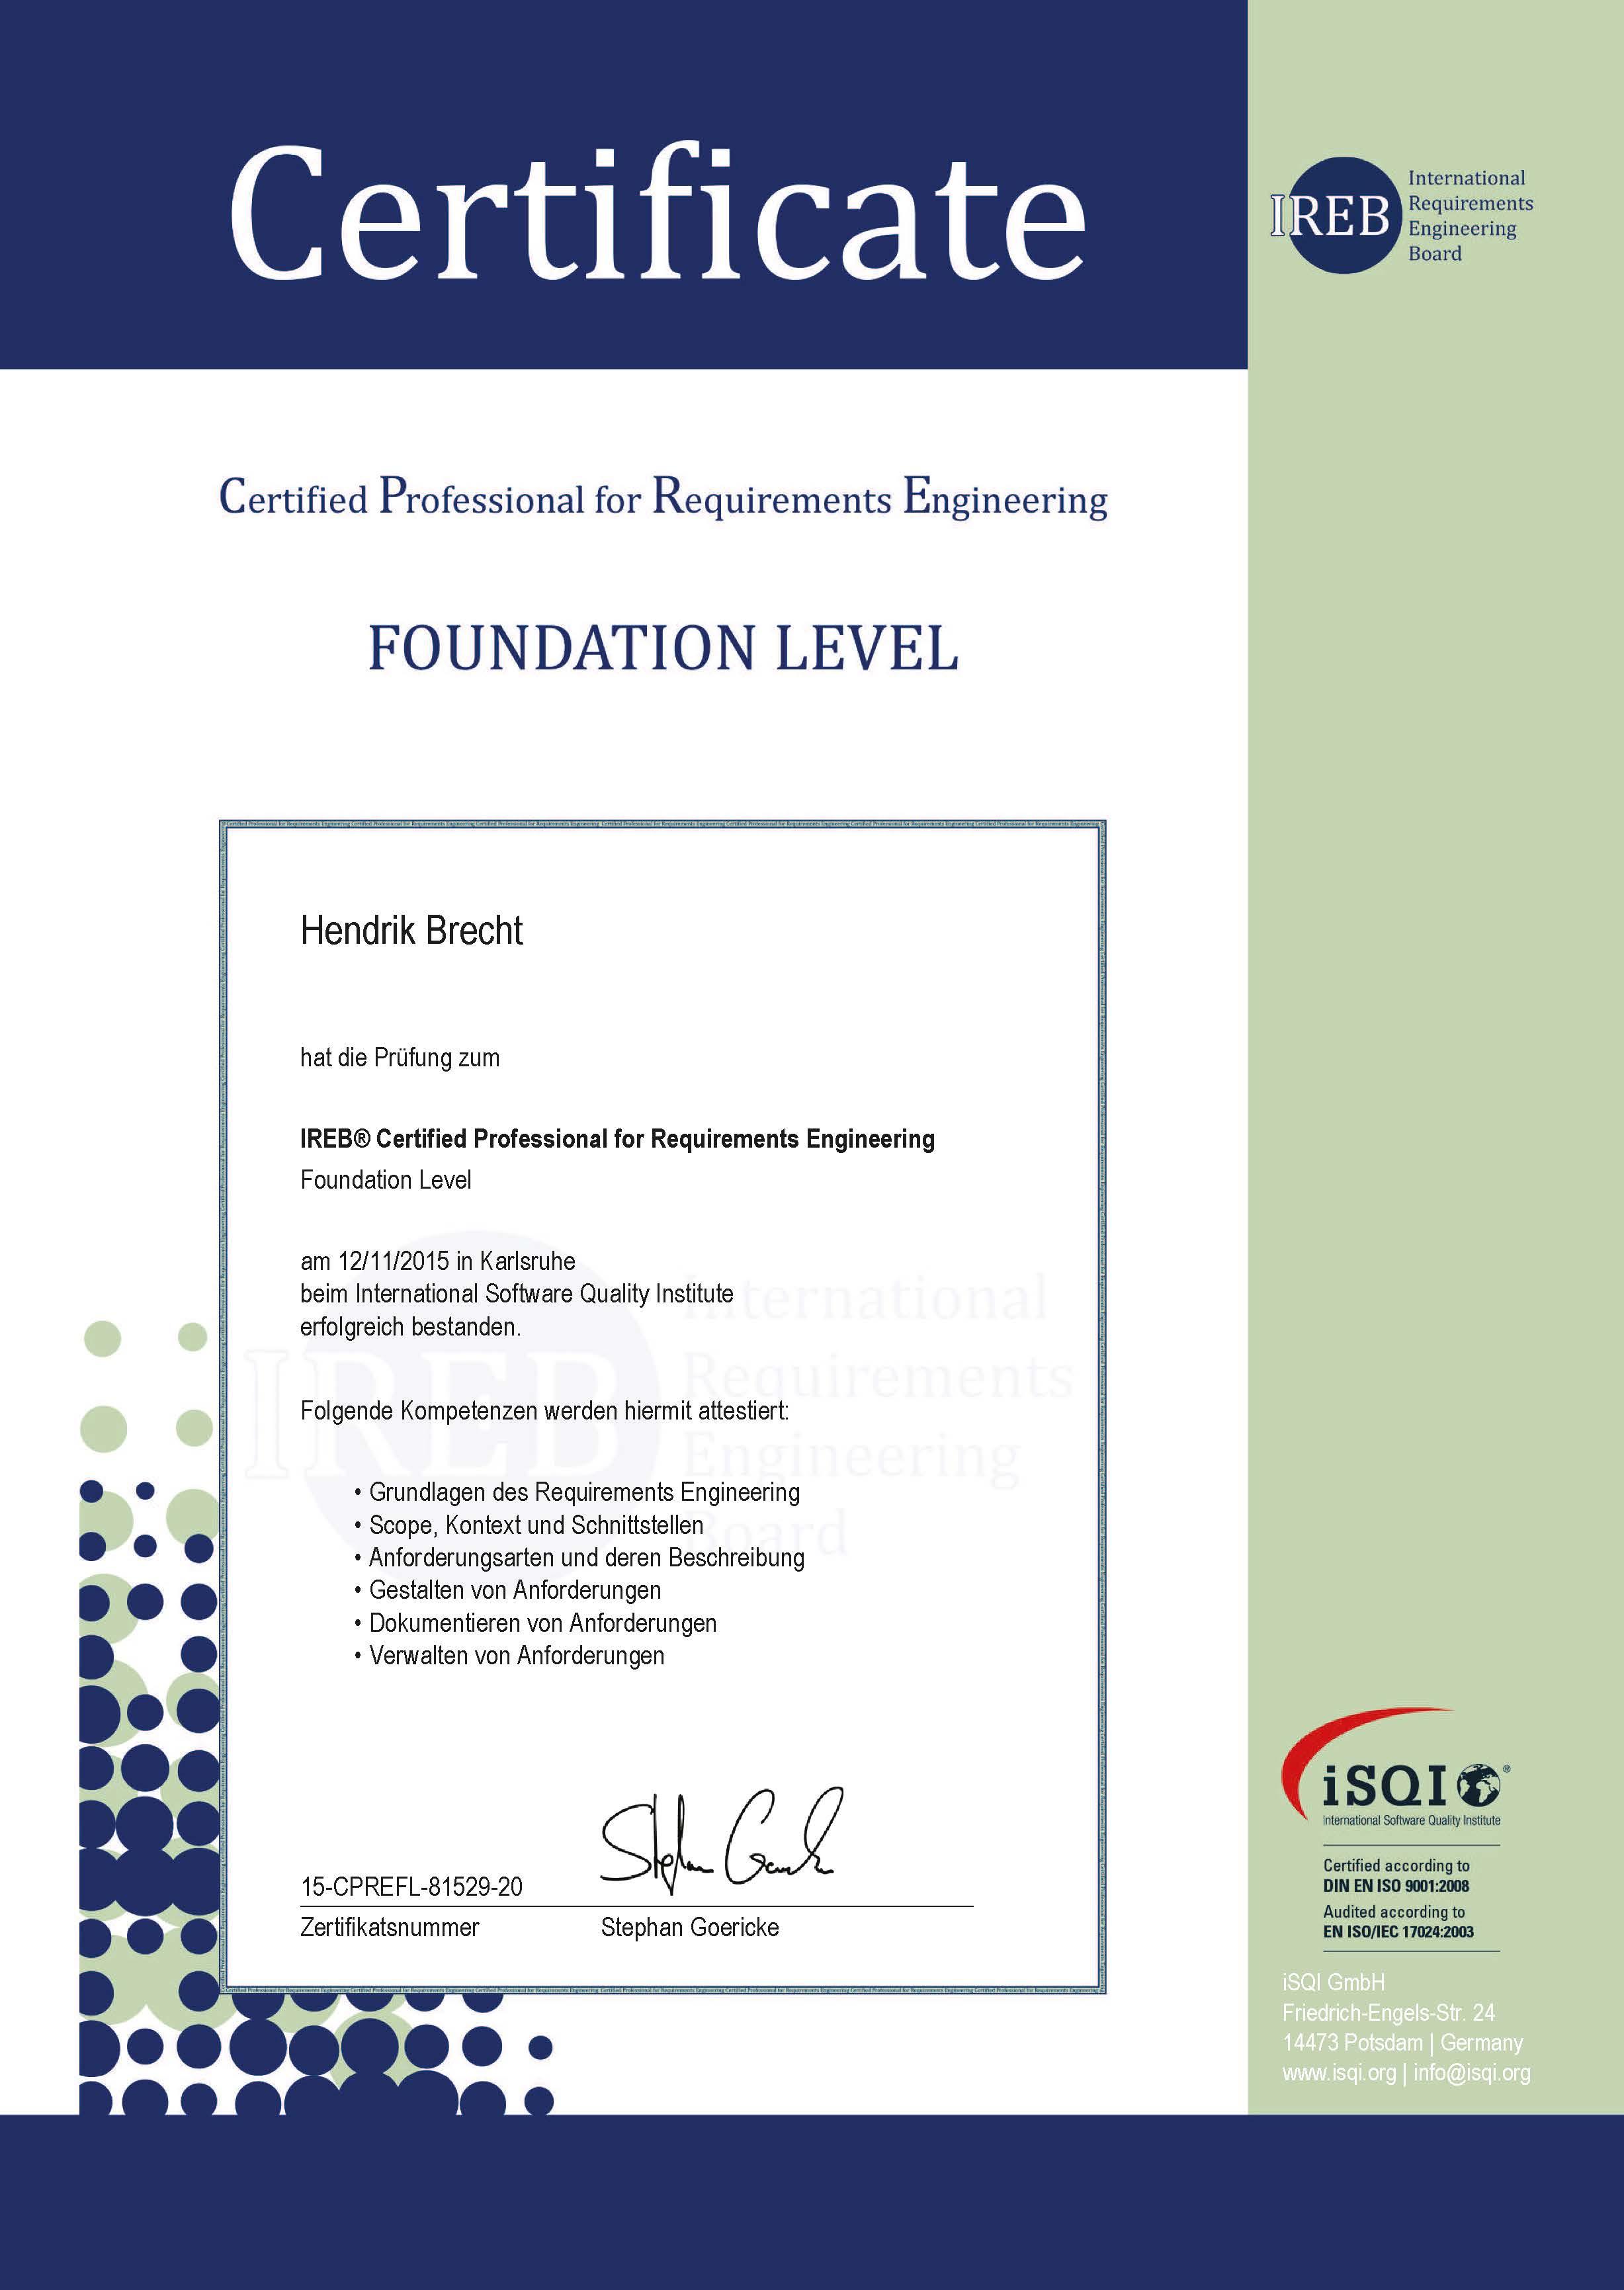 Hendrik Brecht - Certified Professional for Requirements Engineering - 2015 CPRE